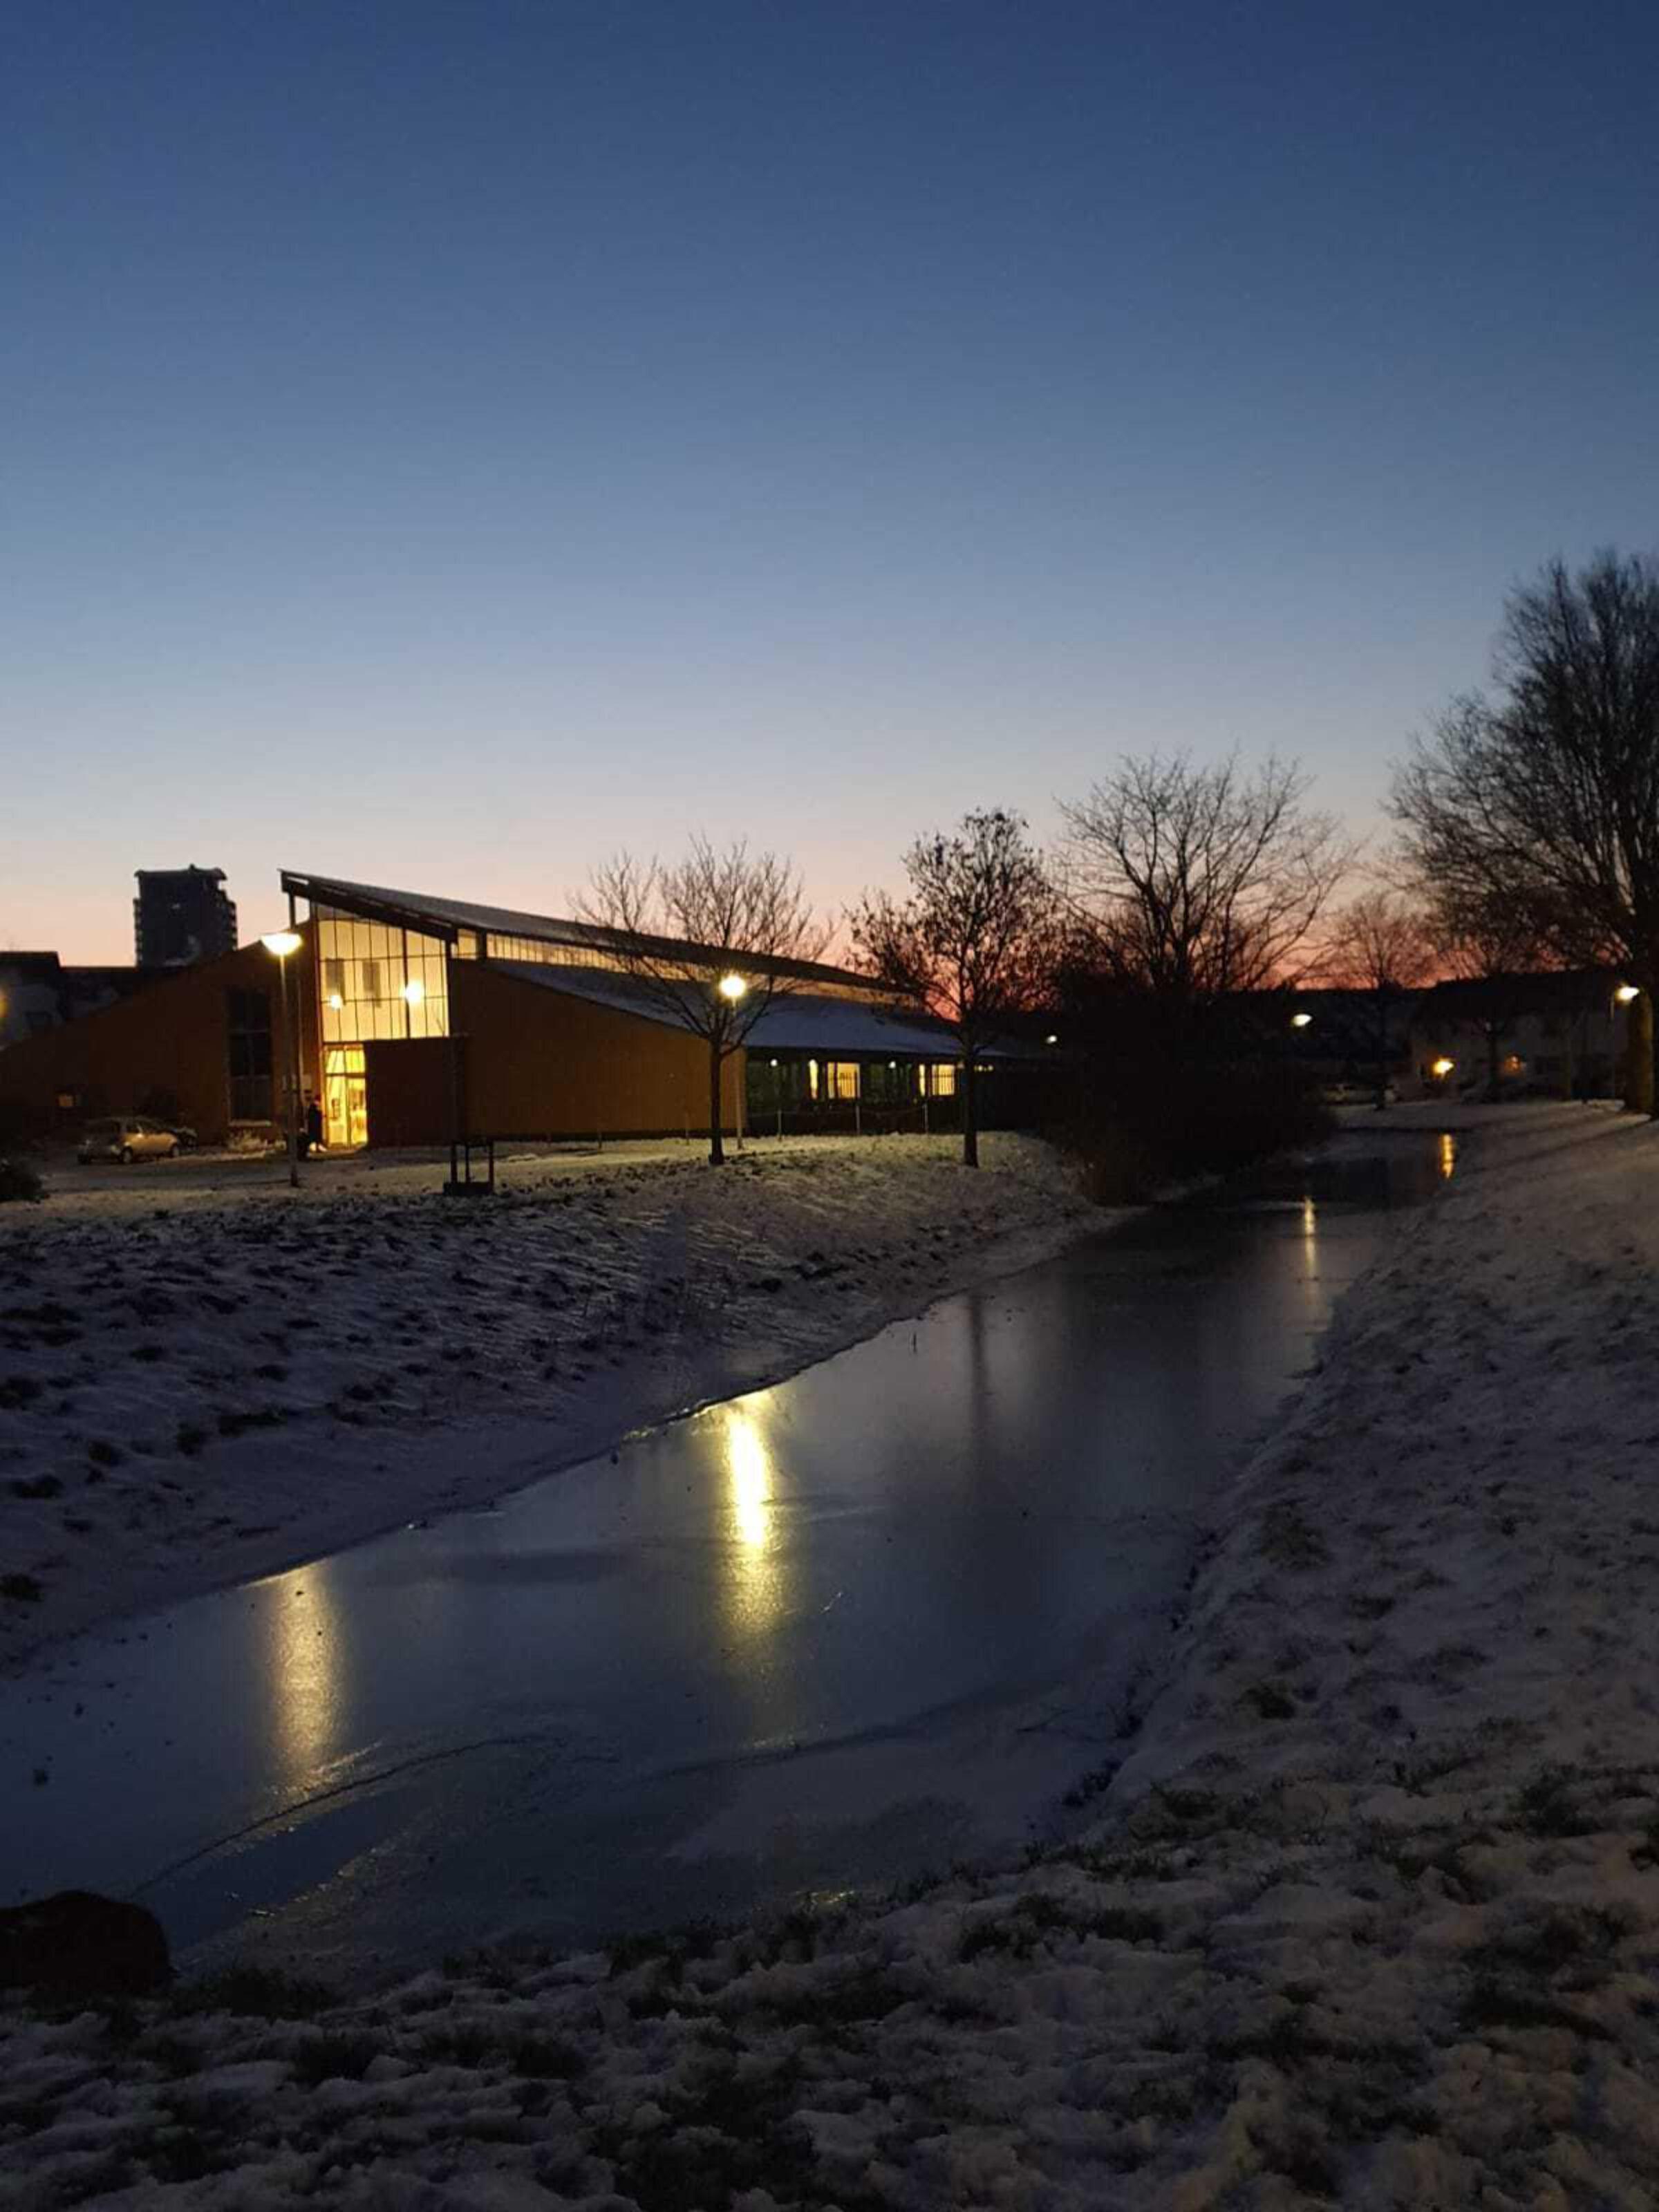 Sneeuwfoto in het donker